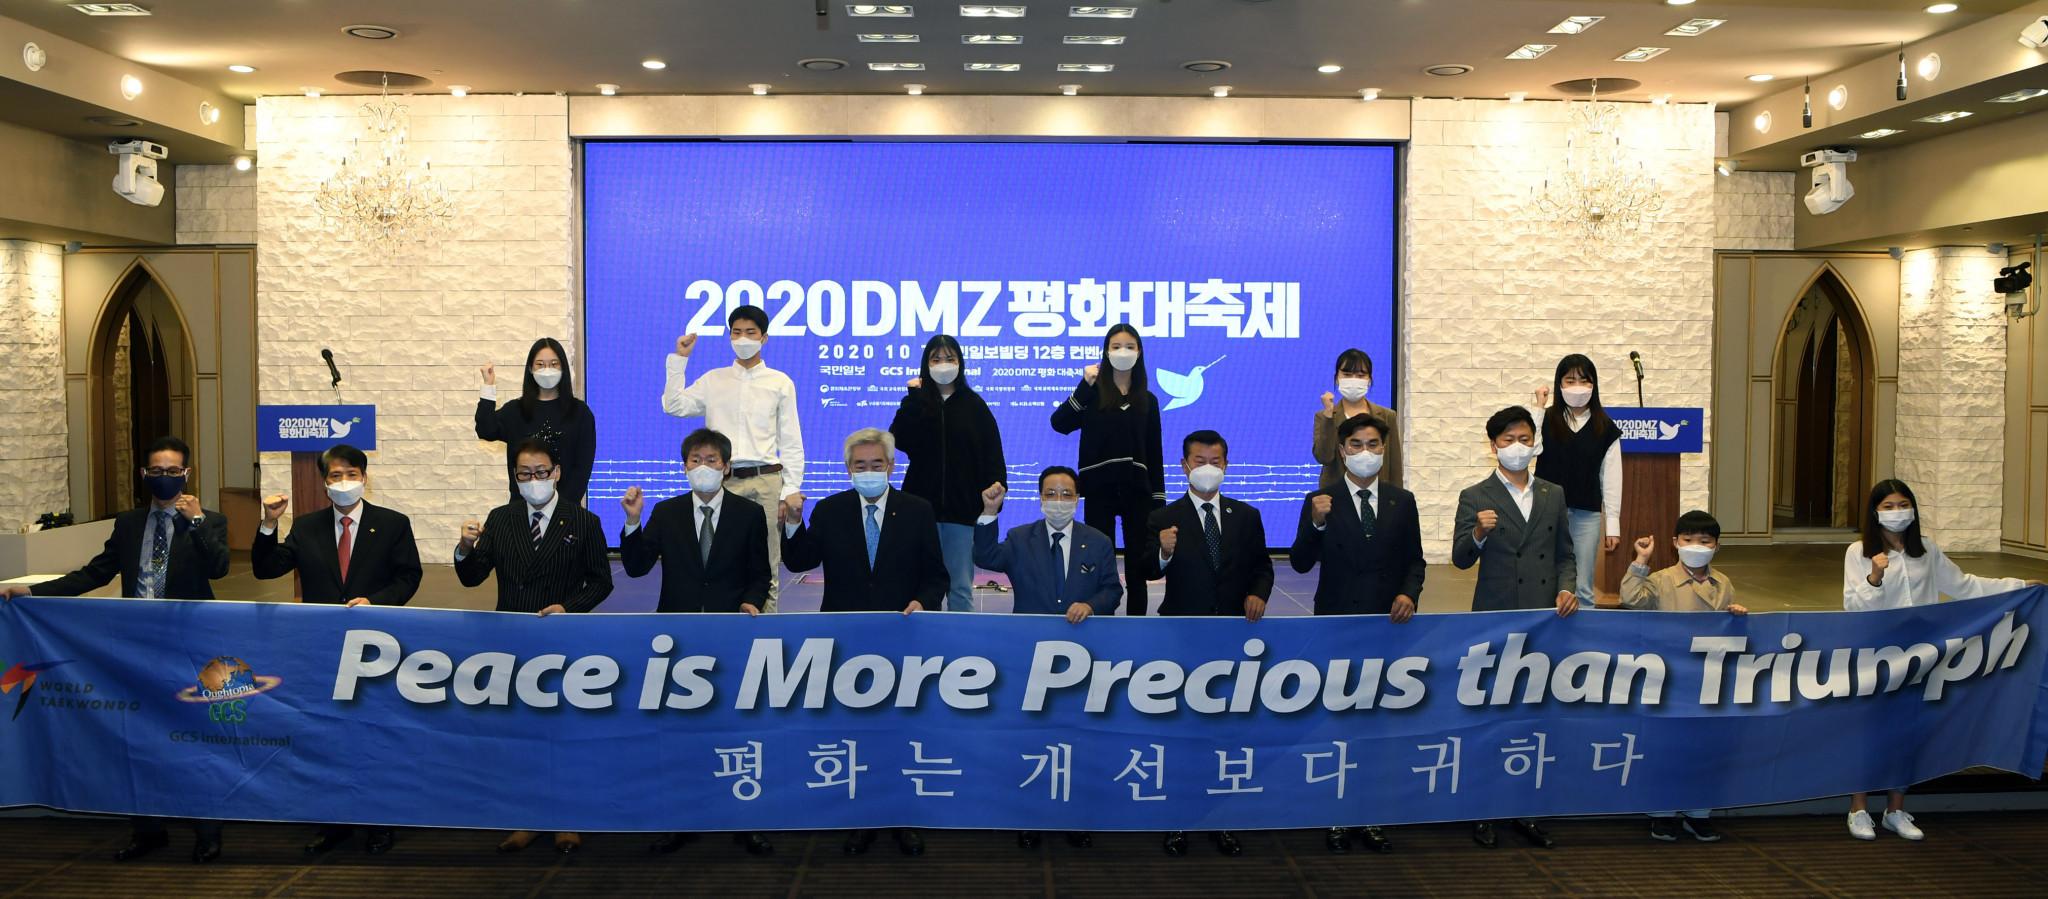 World Taekwondo President Choue attends DMZ Peace Festival